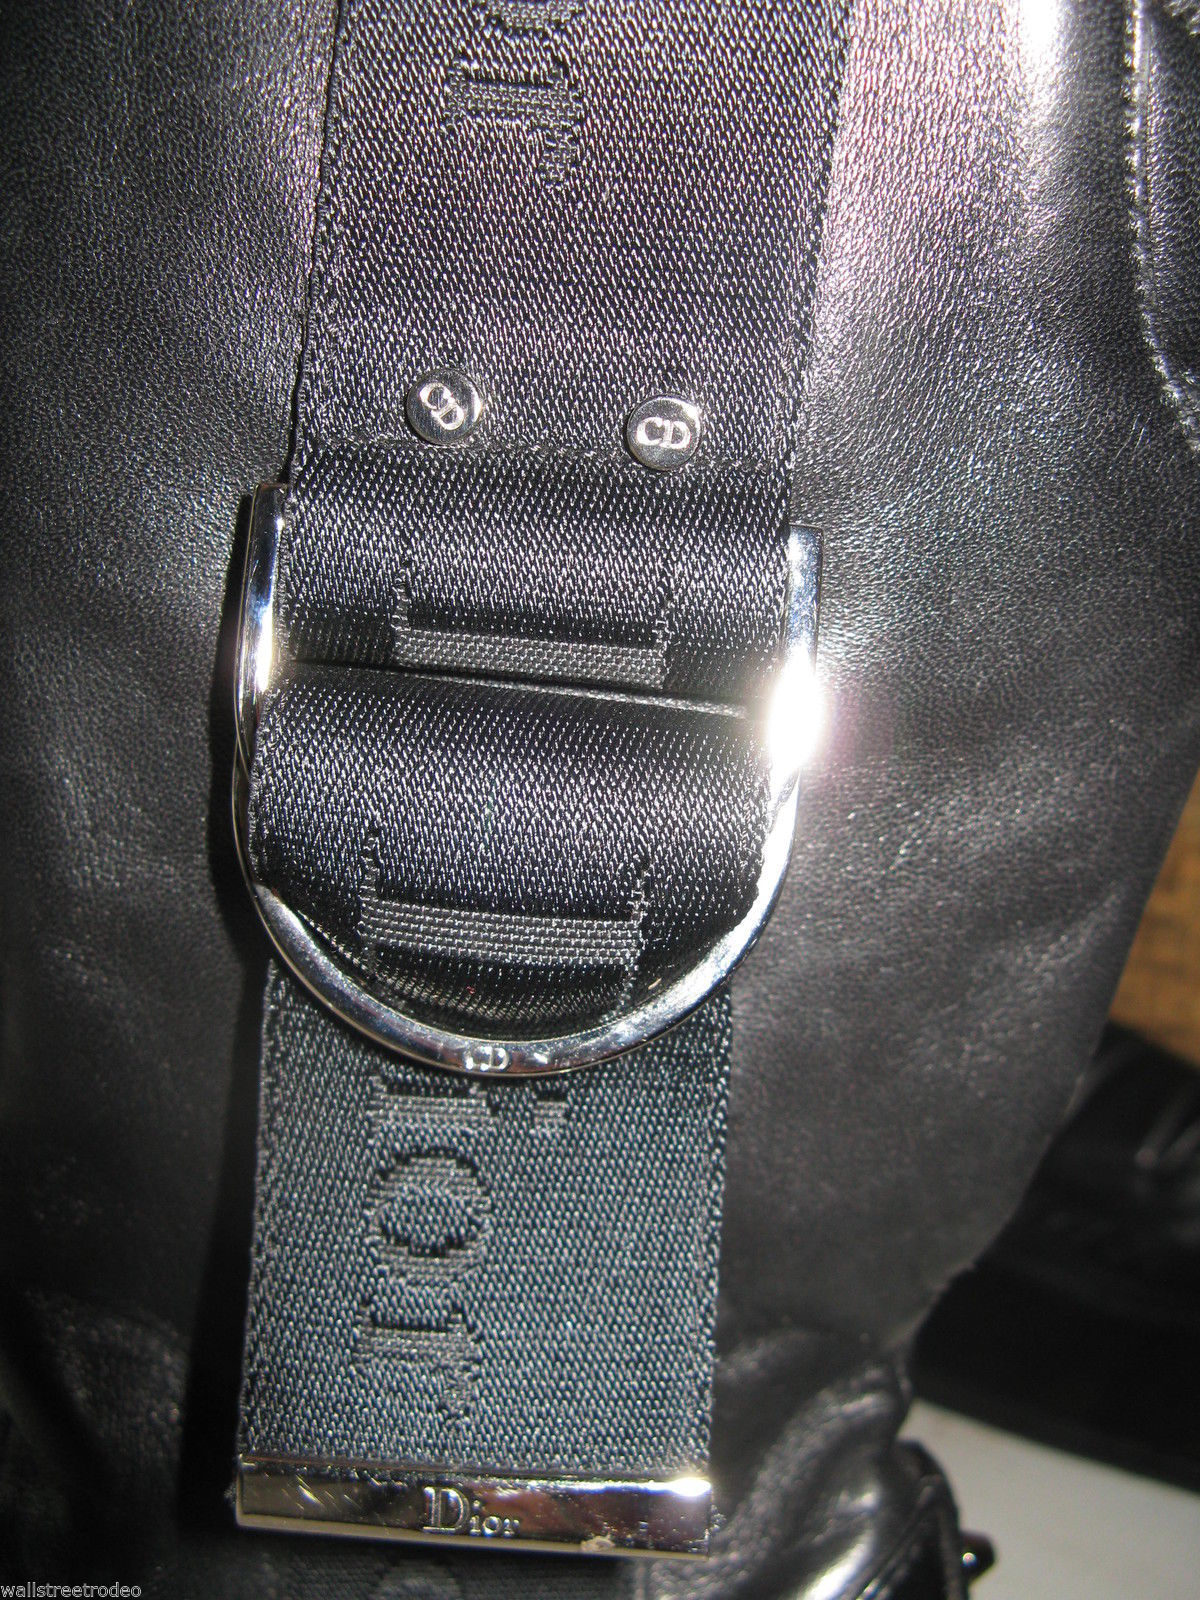 Dior biker logo quilted butter leather motorcylce punk runway boots 6 36 UK3.5 image 8